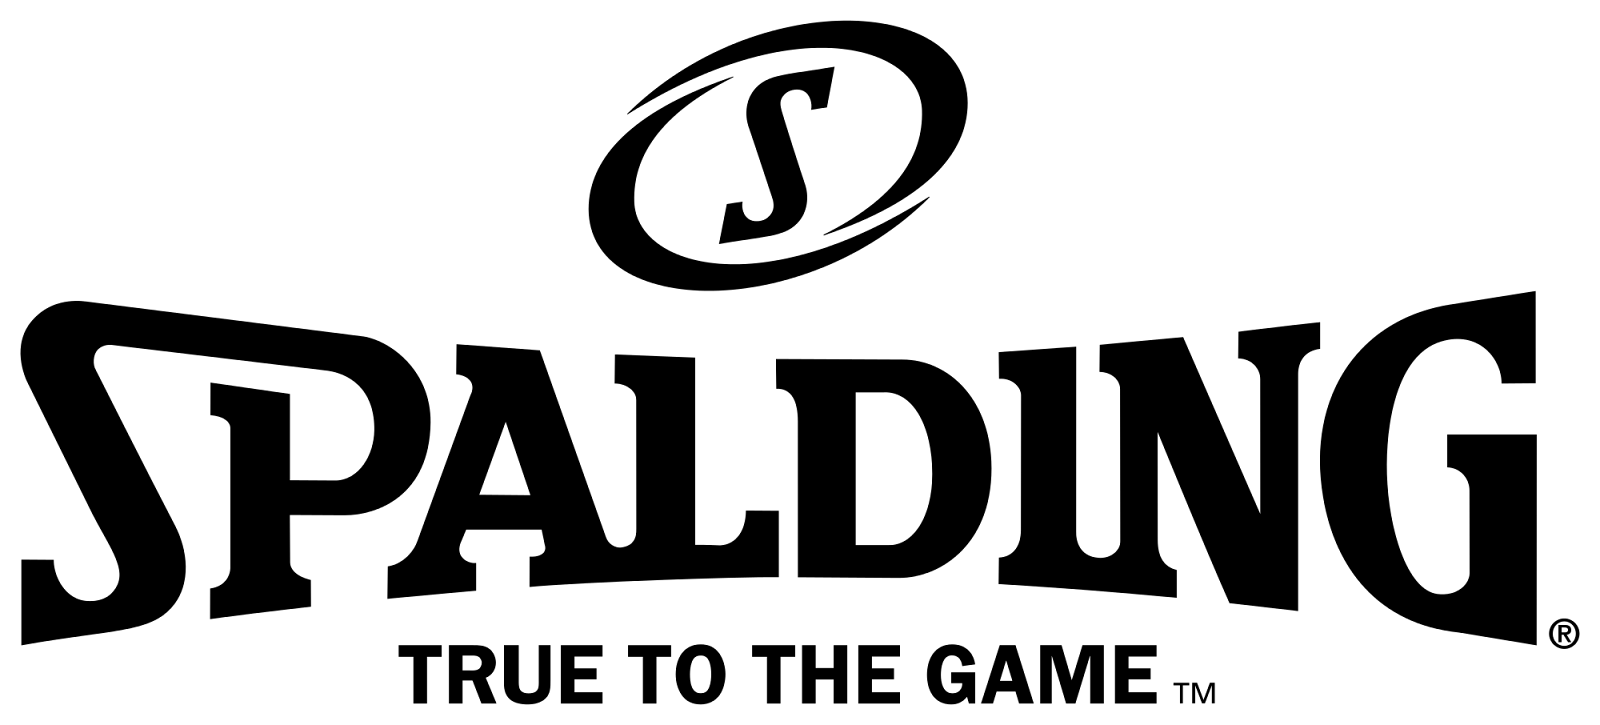 Spalding_(Unternehmen)_logo.svg.png